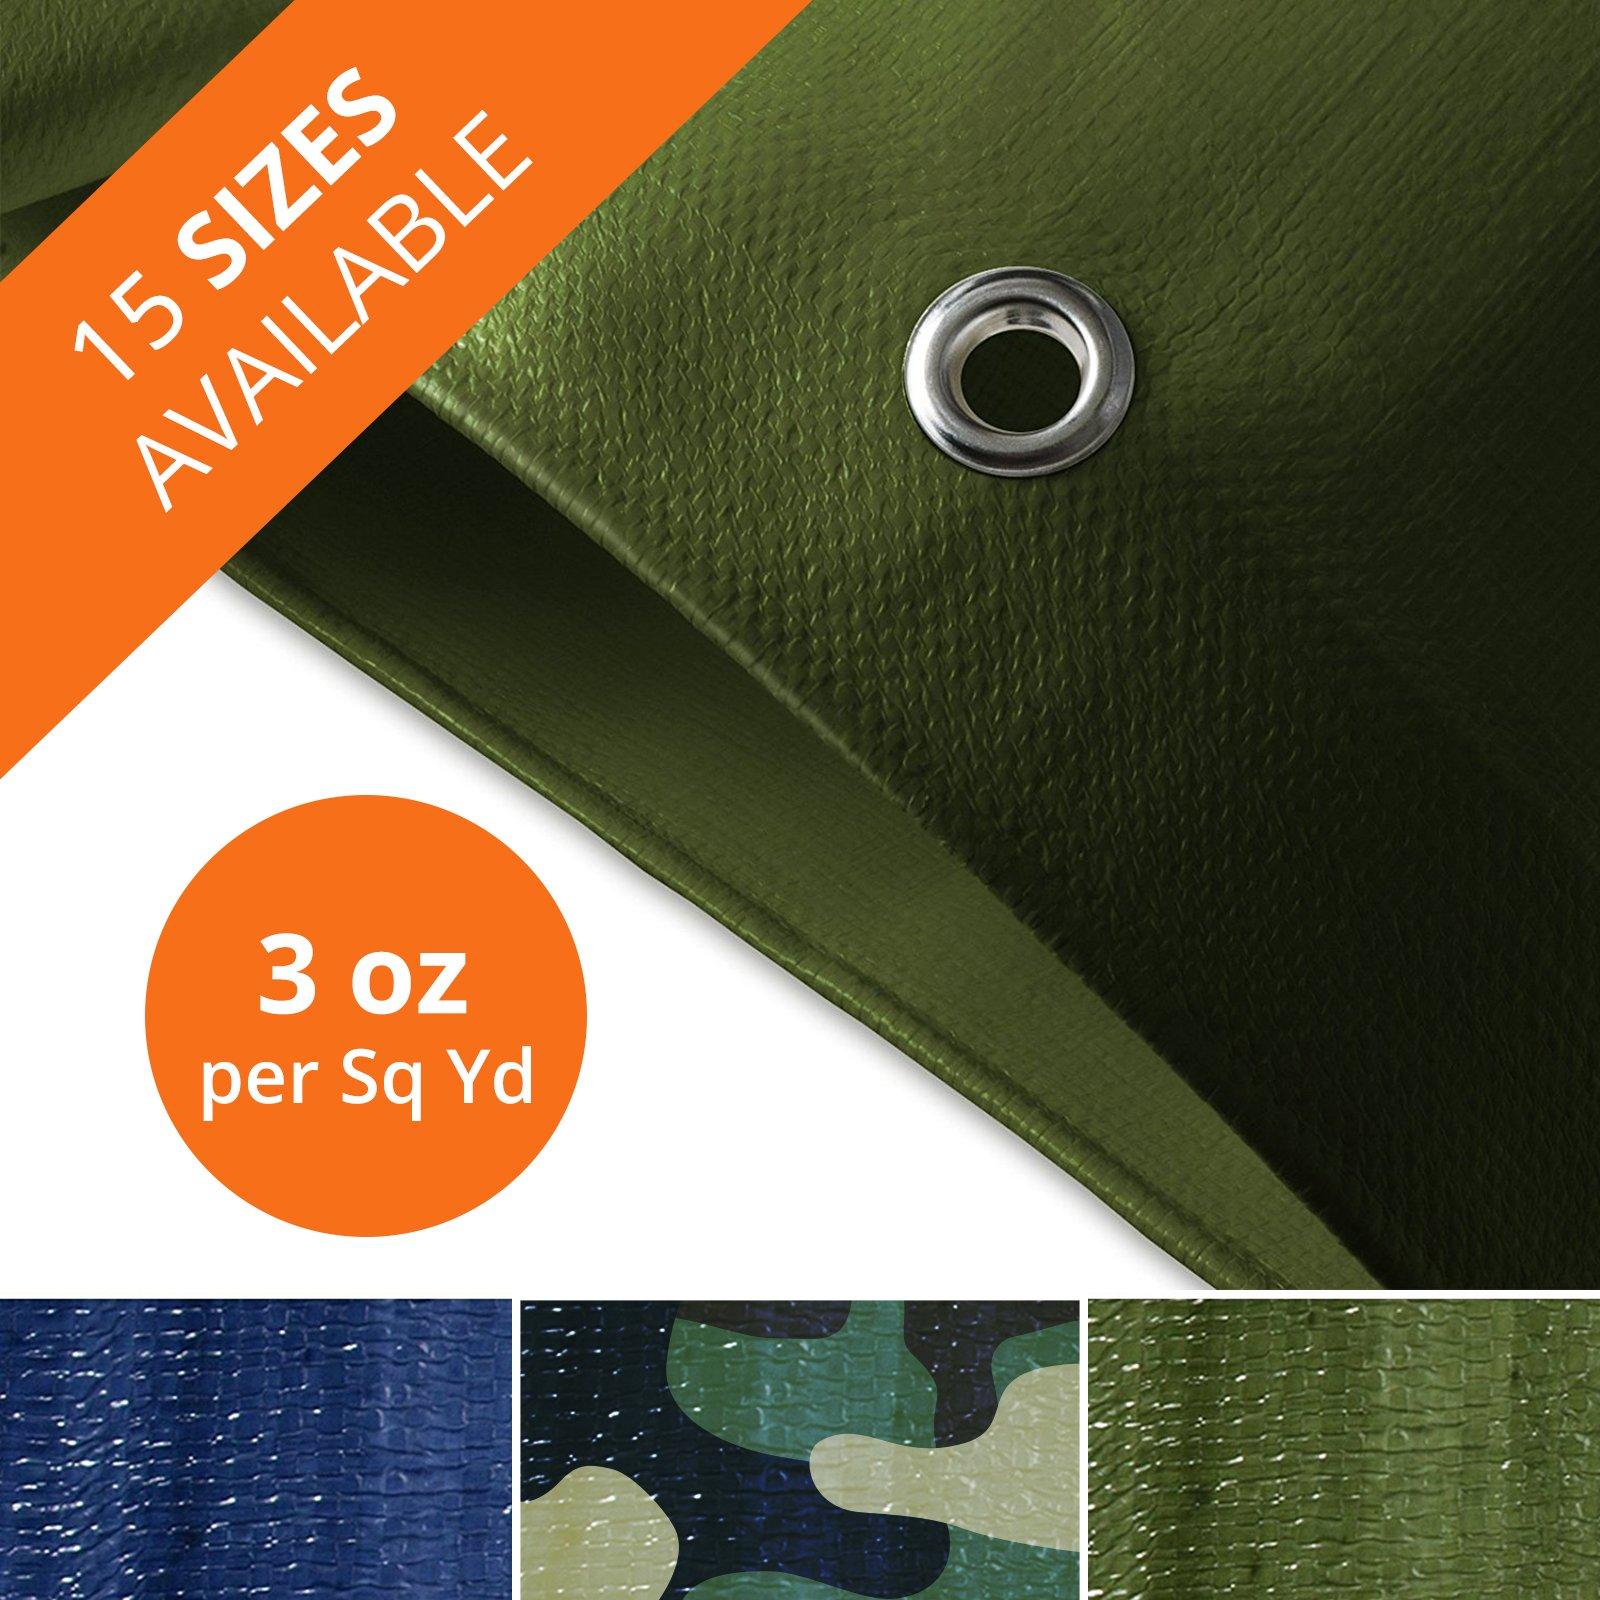 casa pura Tarp | Light Duty Waterproof Tarpaulin | Ultralight Canvas Drop Cover for Handy Application | Multiple Sizes - 0.2'' Thick | 3oz | Blue & Green - 10' x 12'